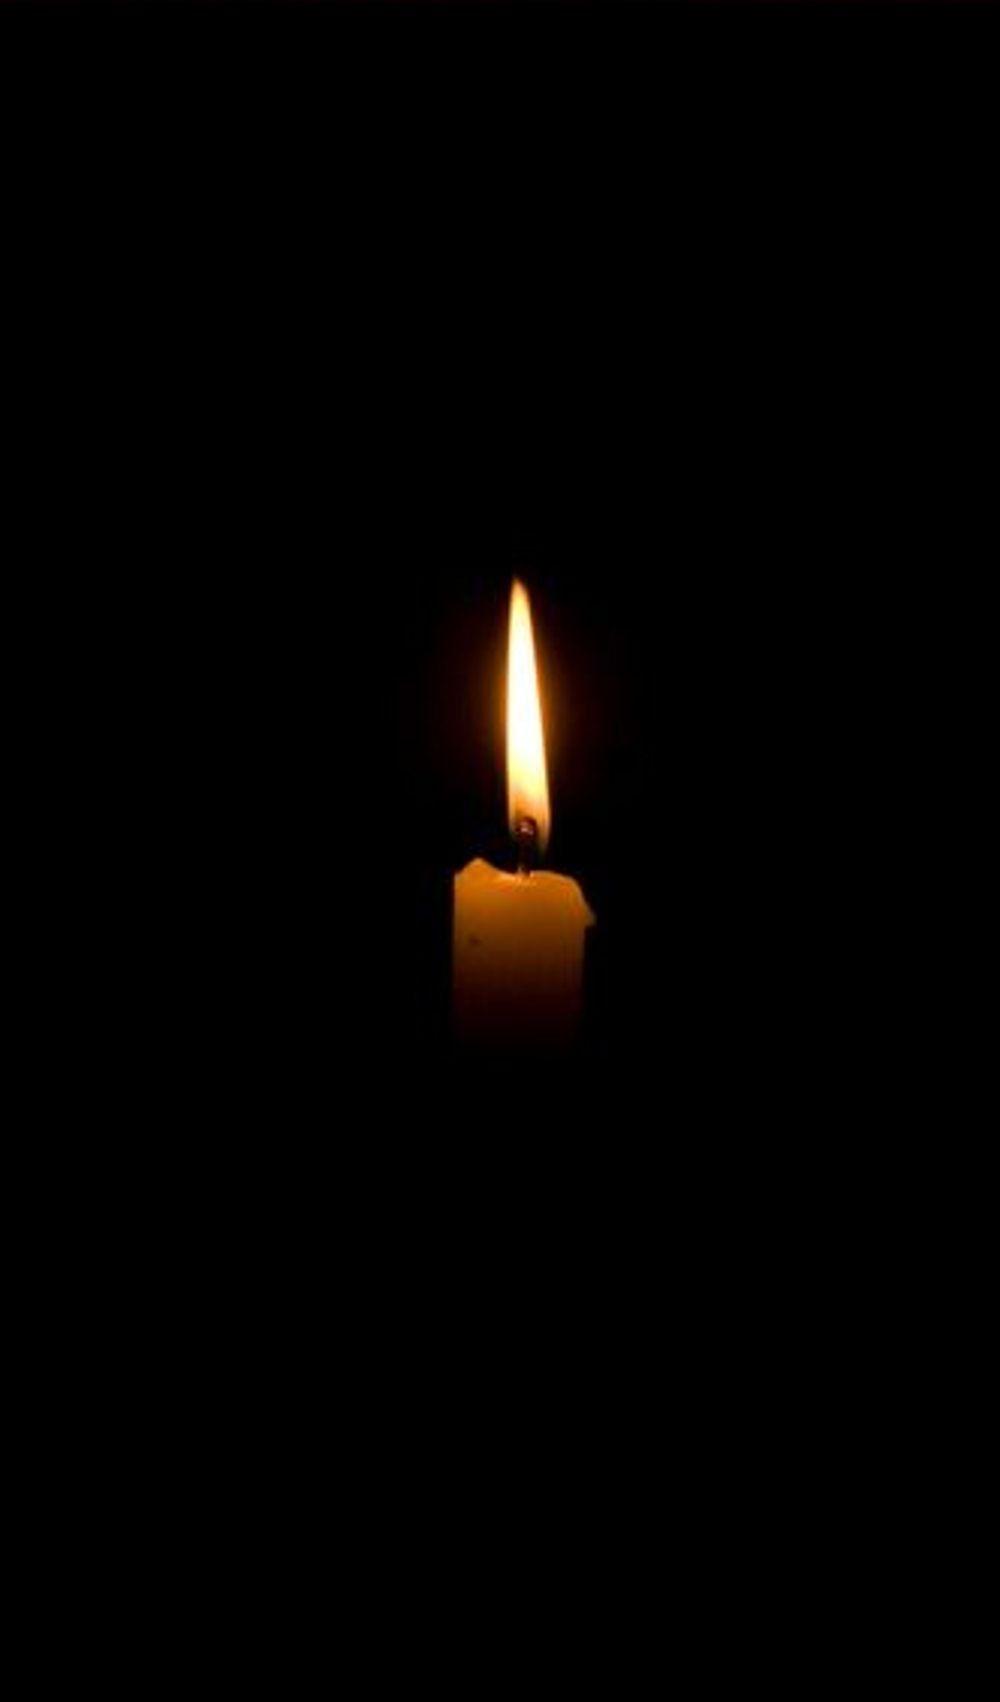 Sonrie Y Recuerda Candles Dark Candle In The Dark Candles Photography